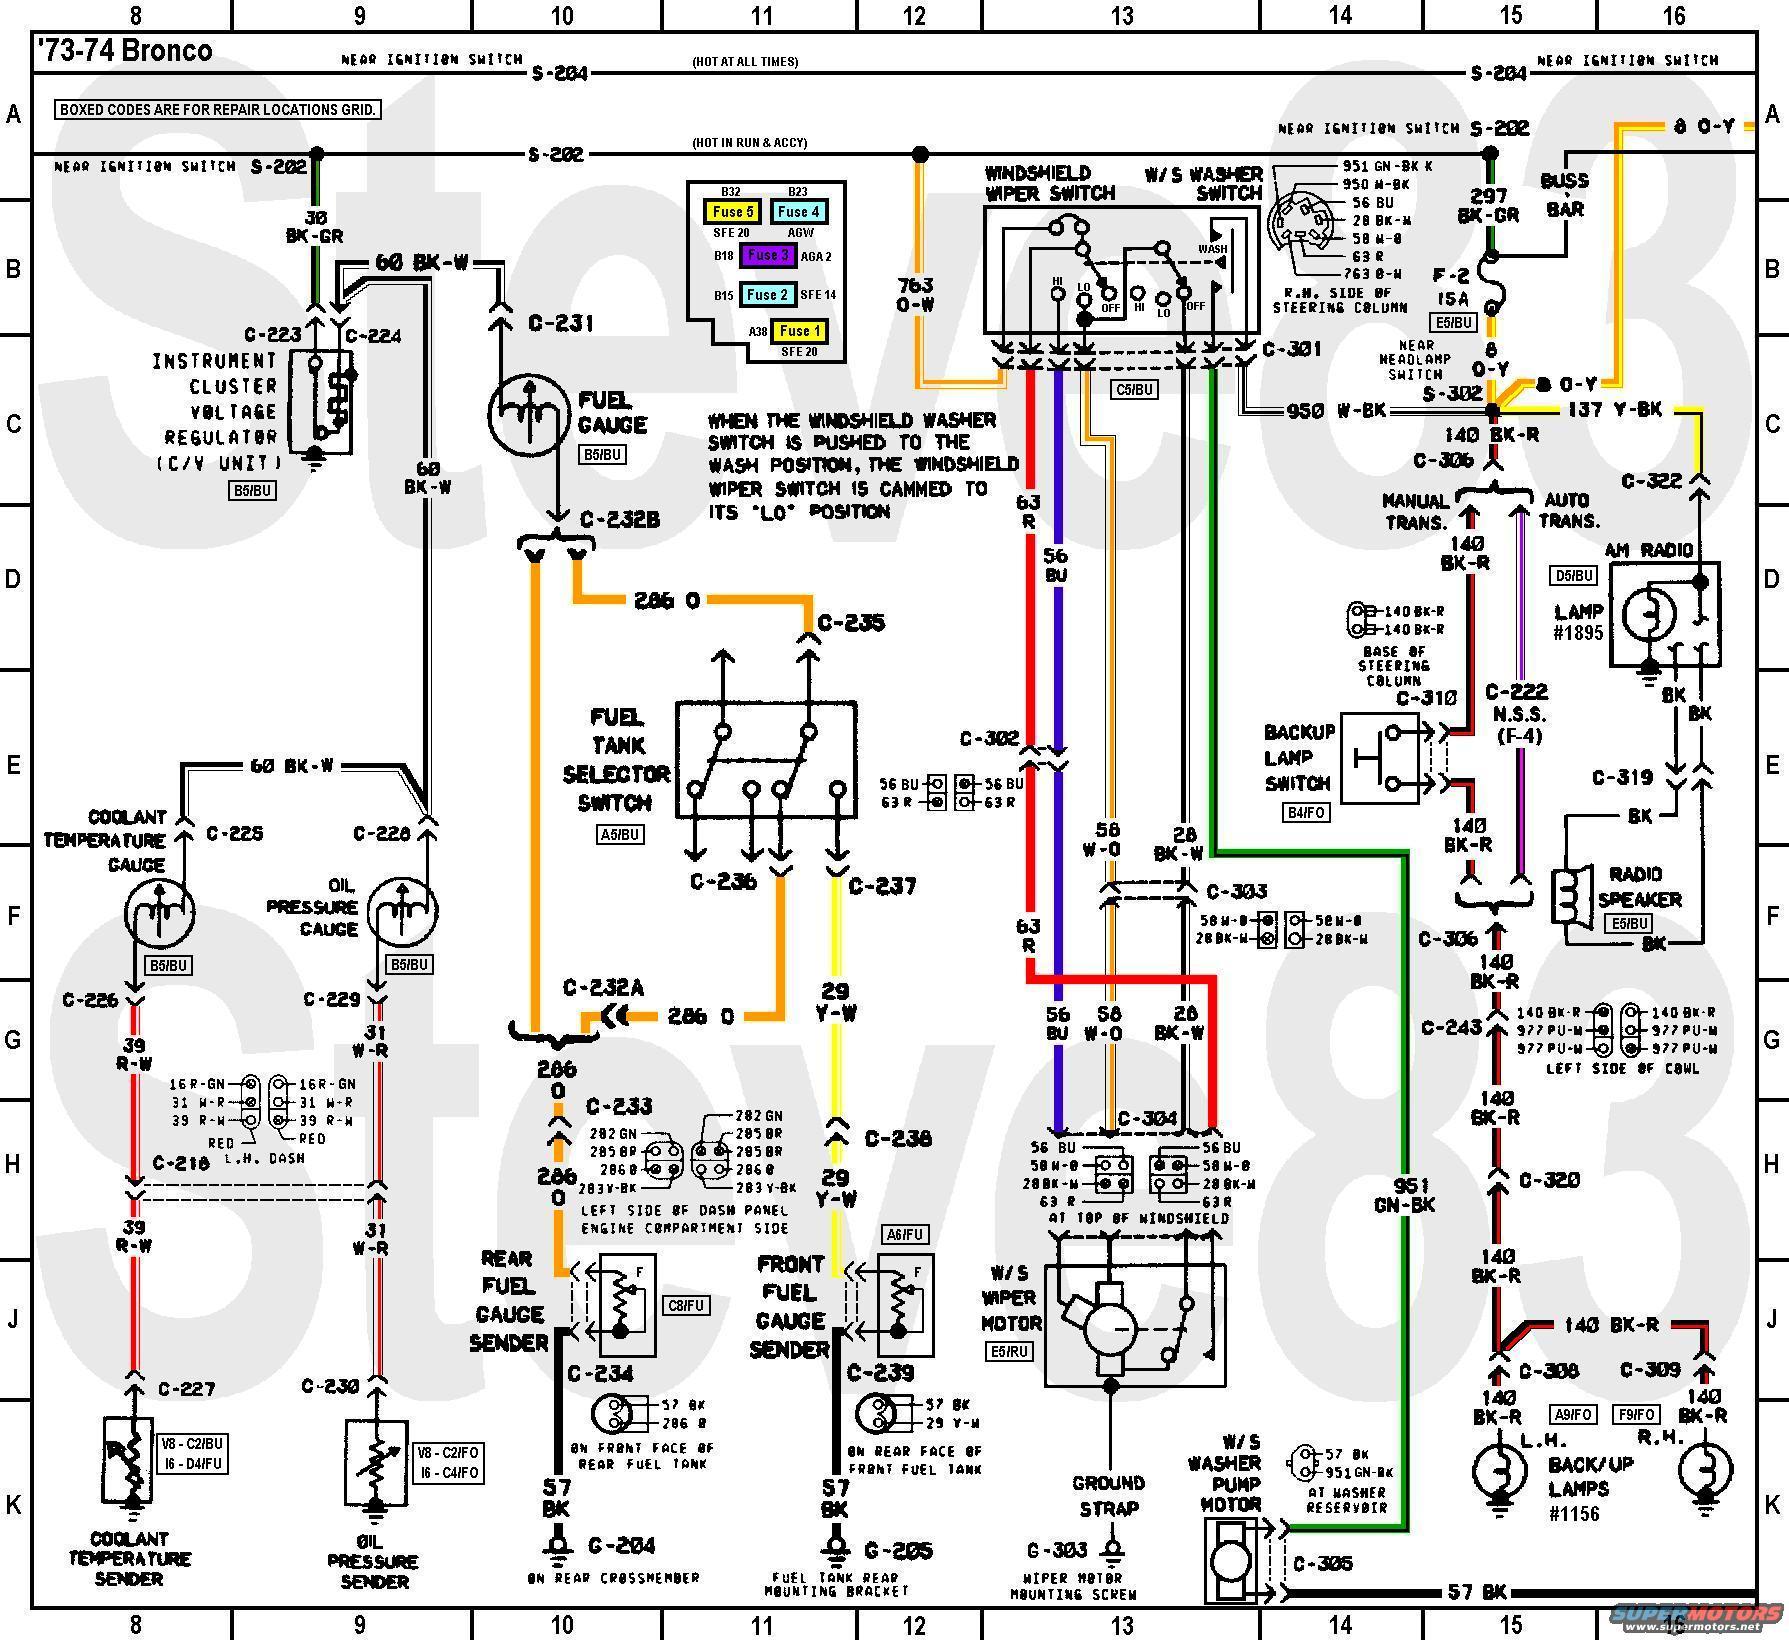 Painless Wiring Fuse Block Diagram Painless Wiring Install Video